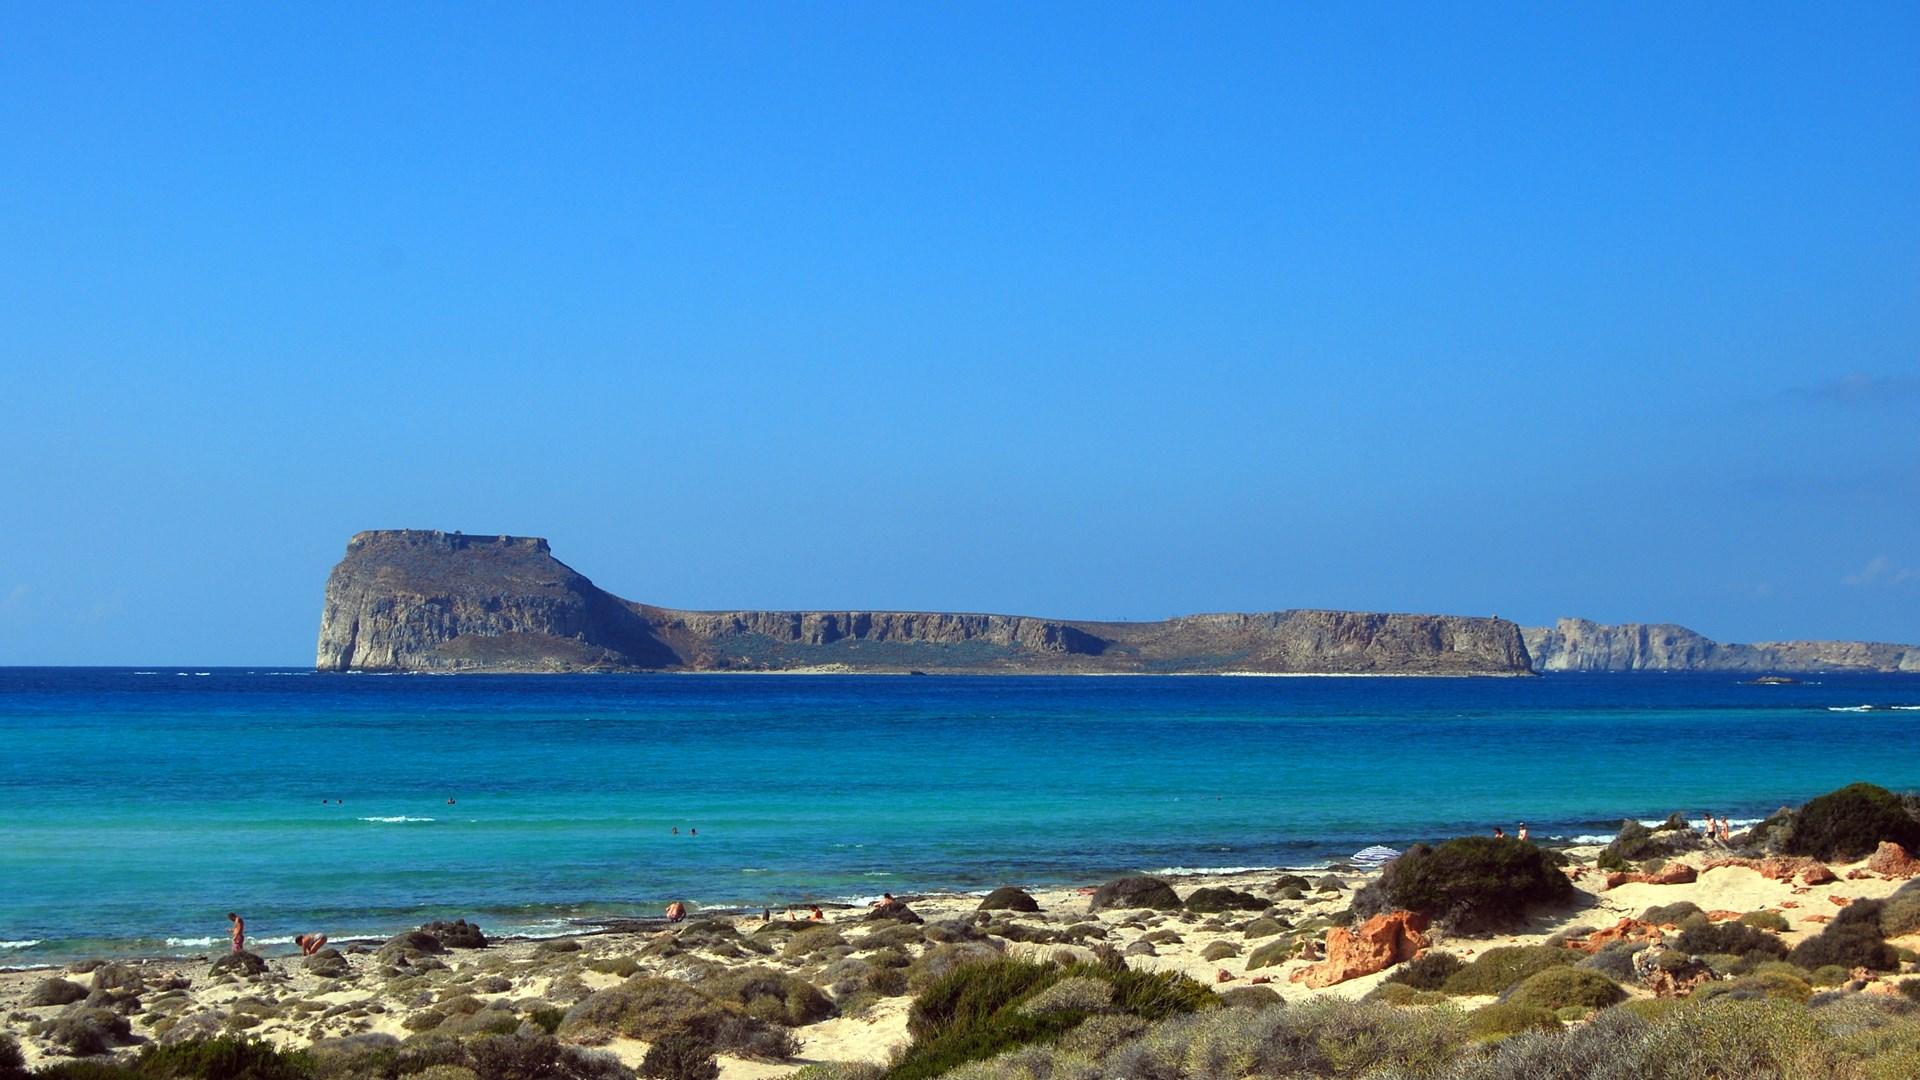 Imeri Gramvousa, Chania-Crete | 18 Sep 2014 | Alargo